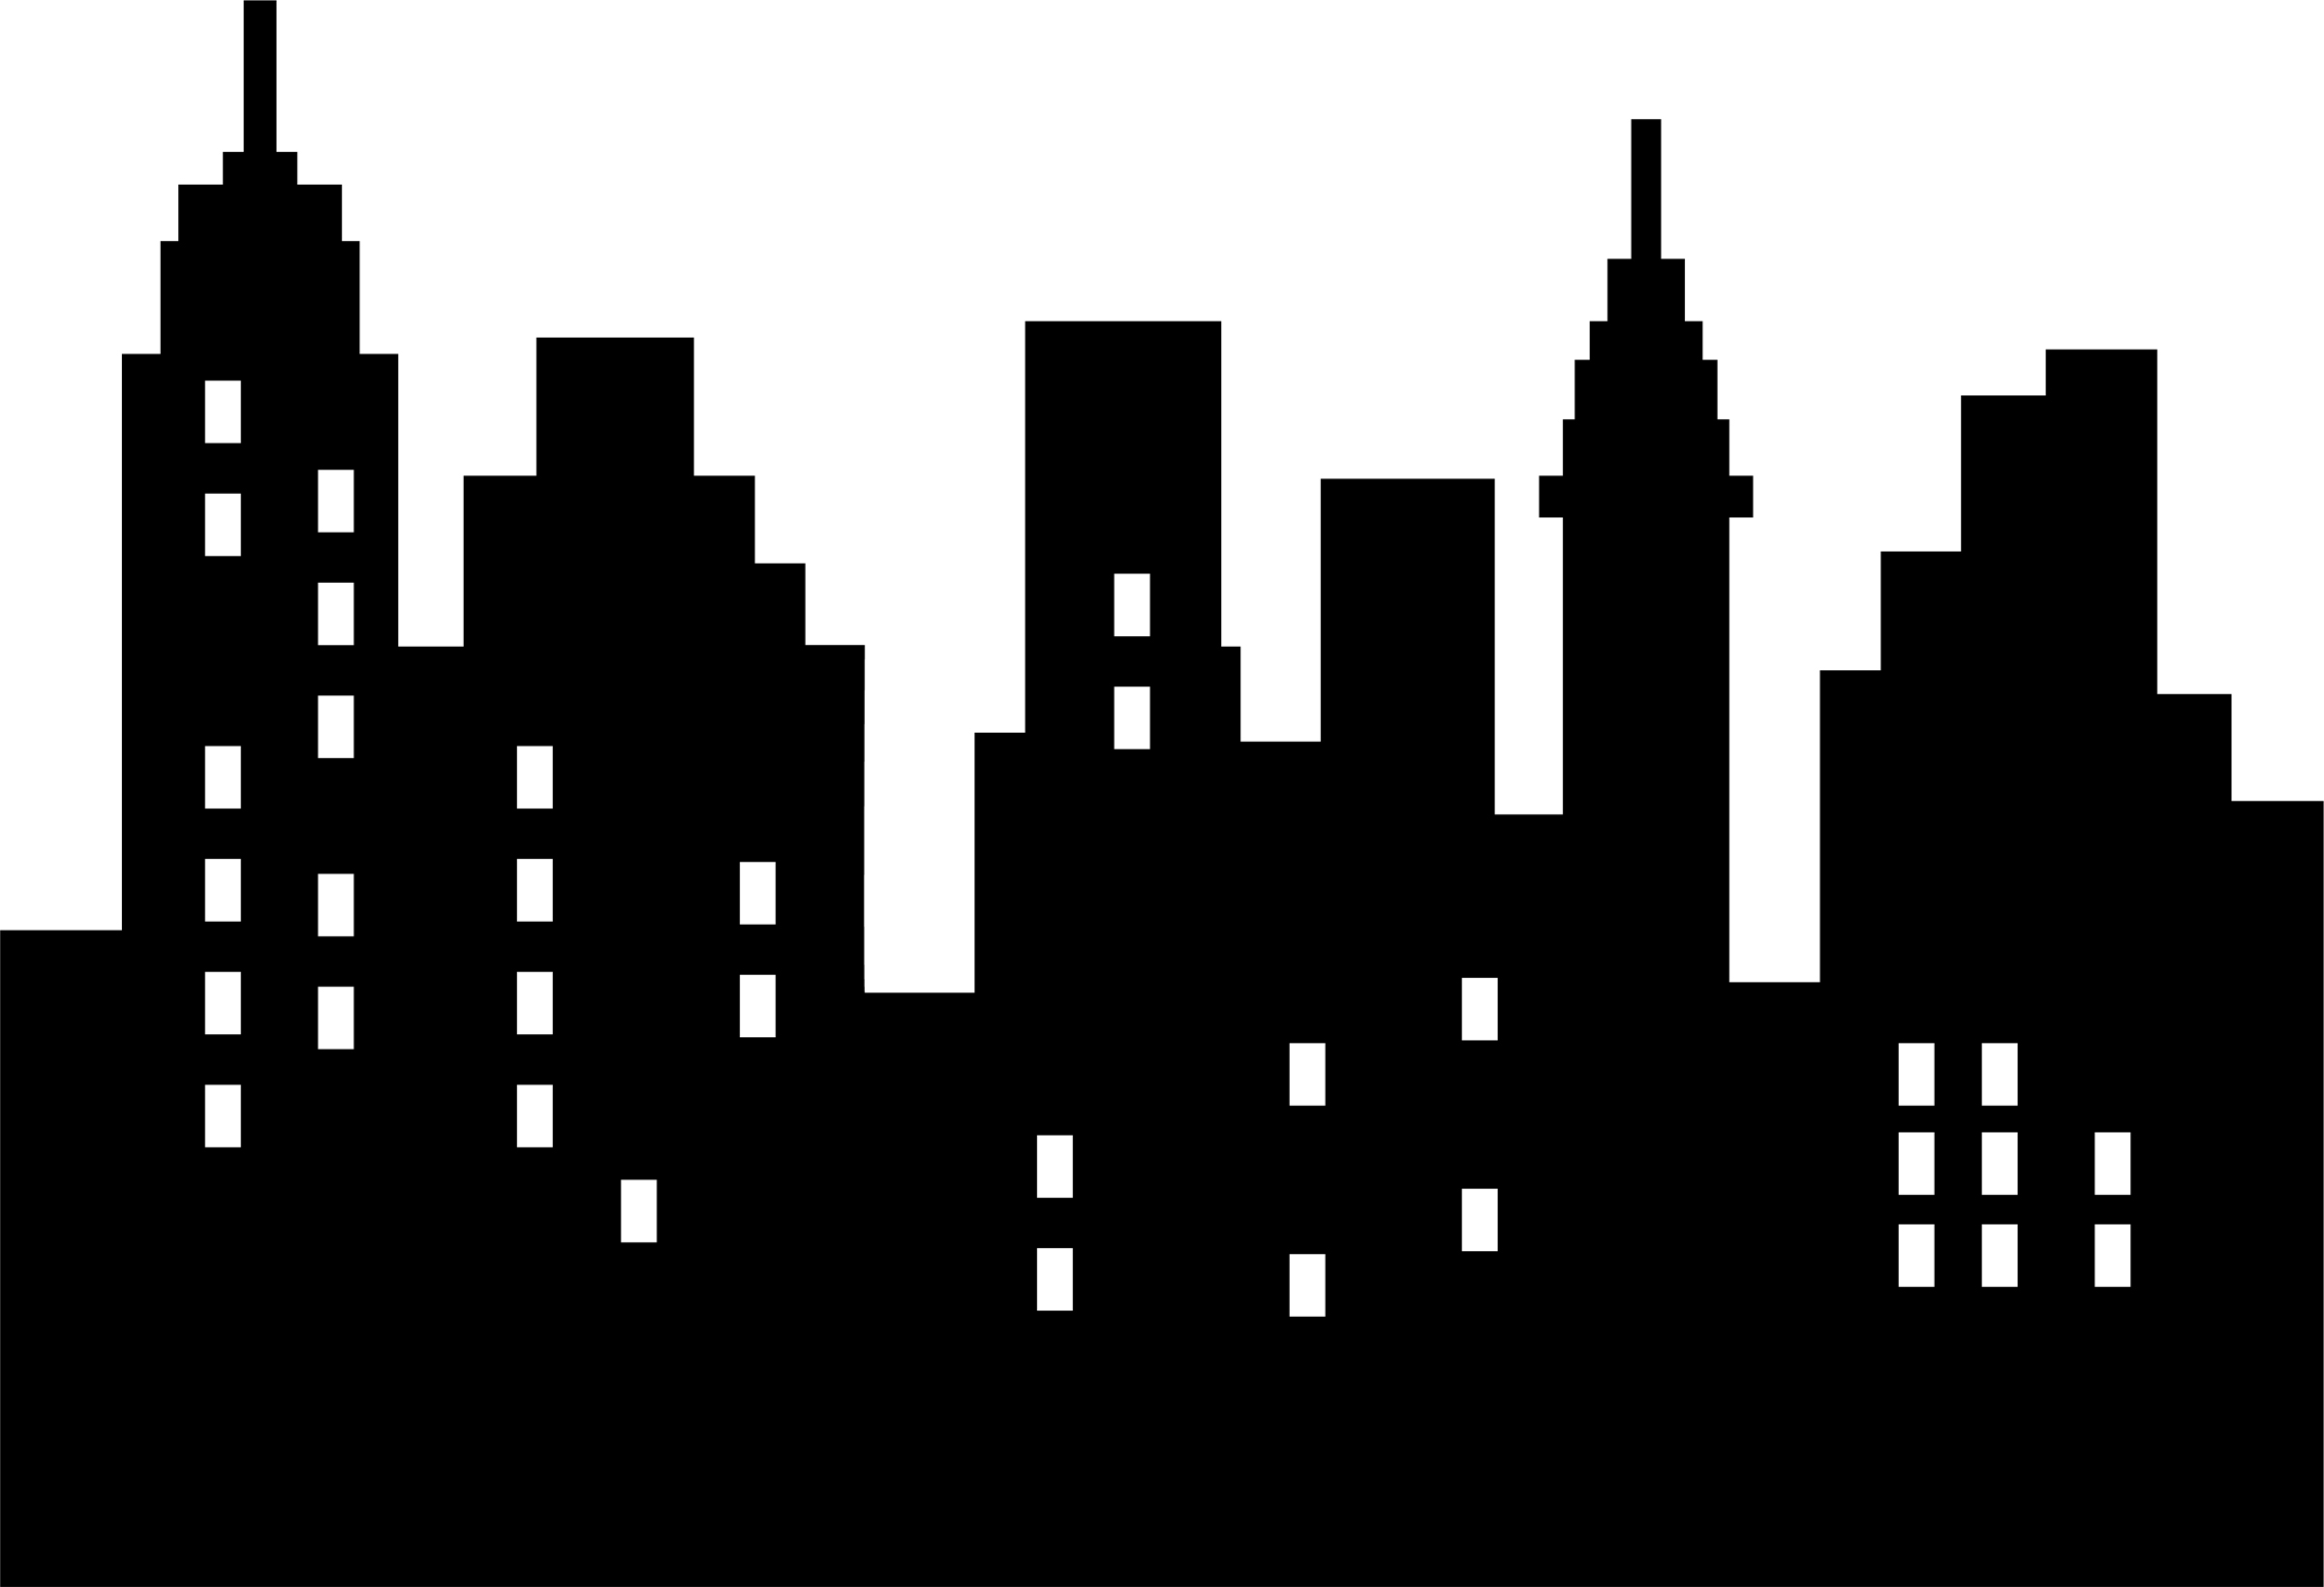 City Clipart: Skyline Clipart-City clipart: Skyline Clipart-5